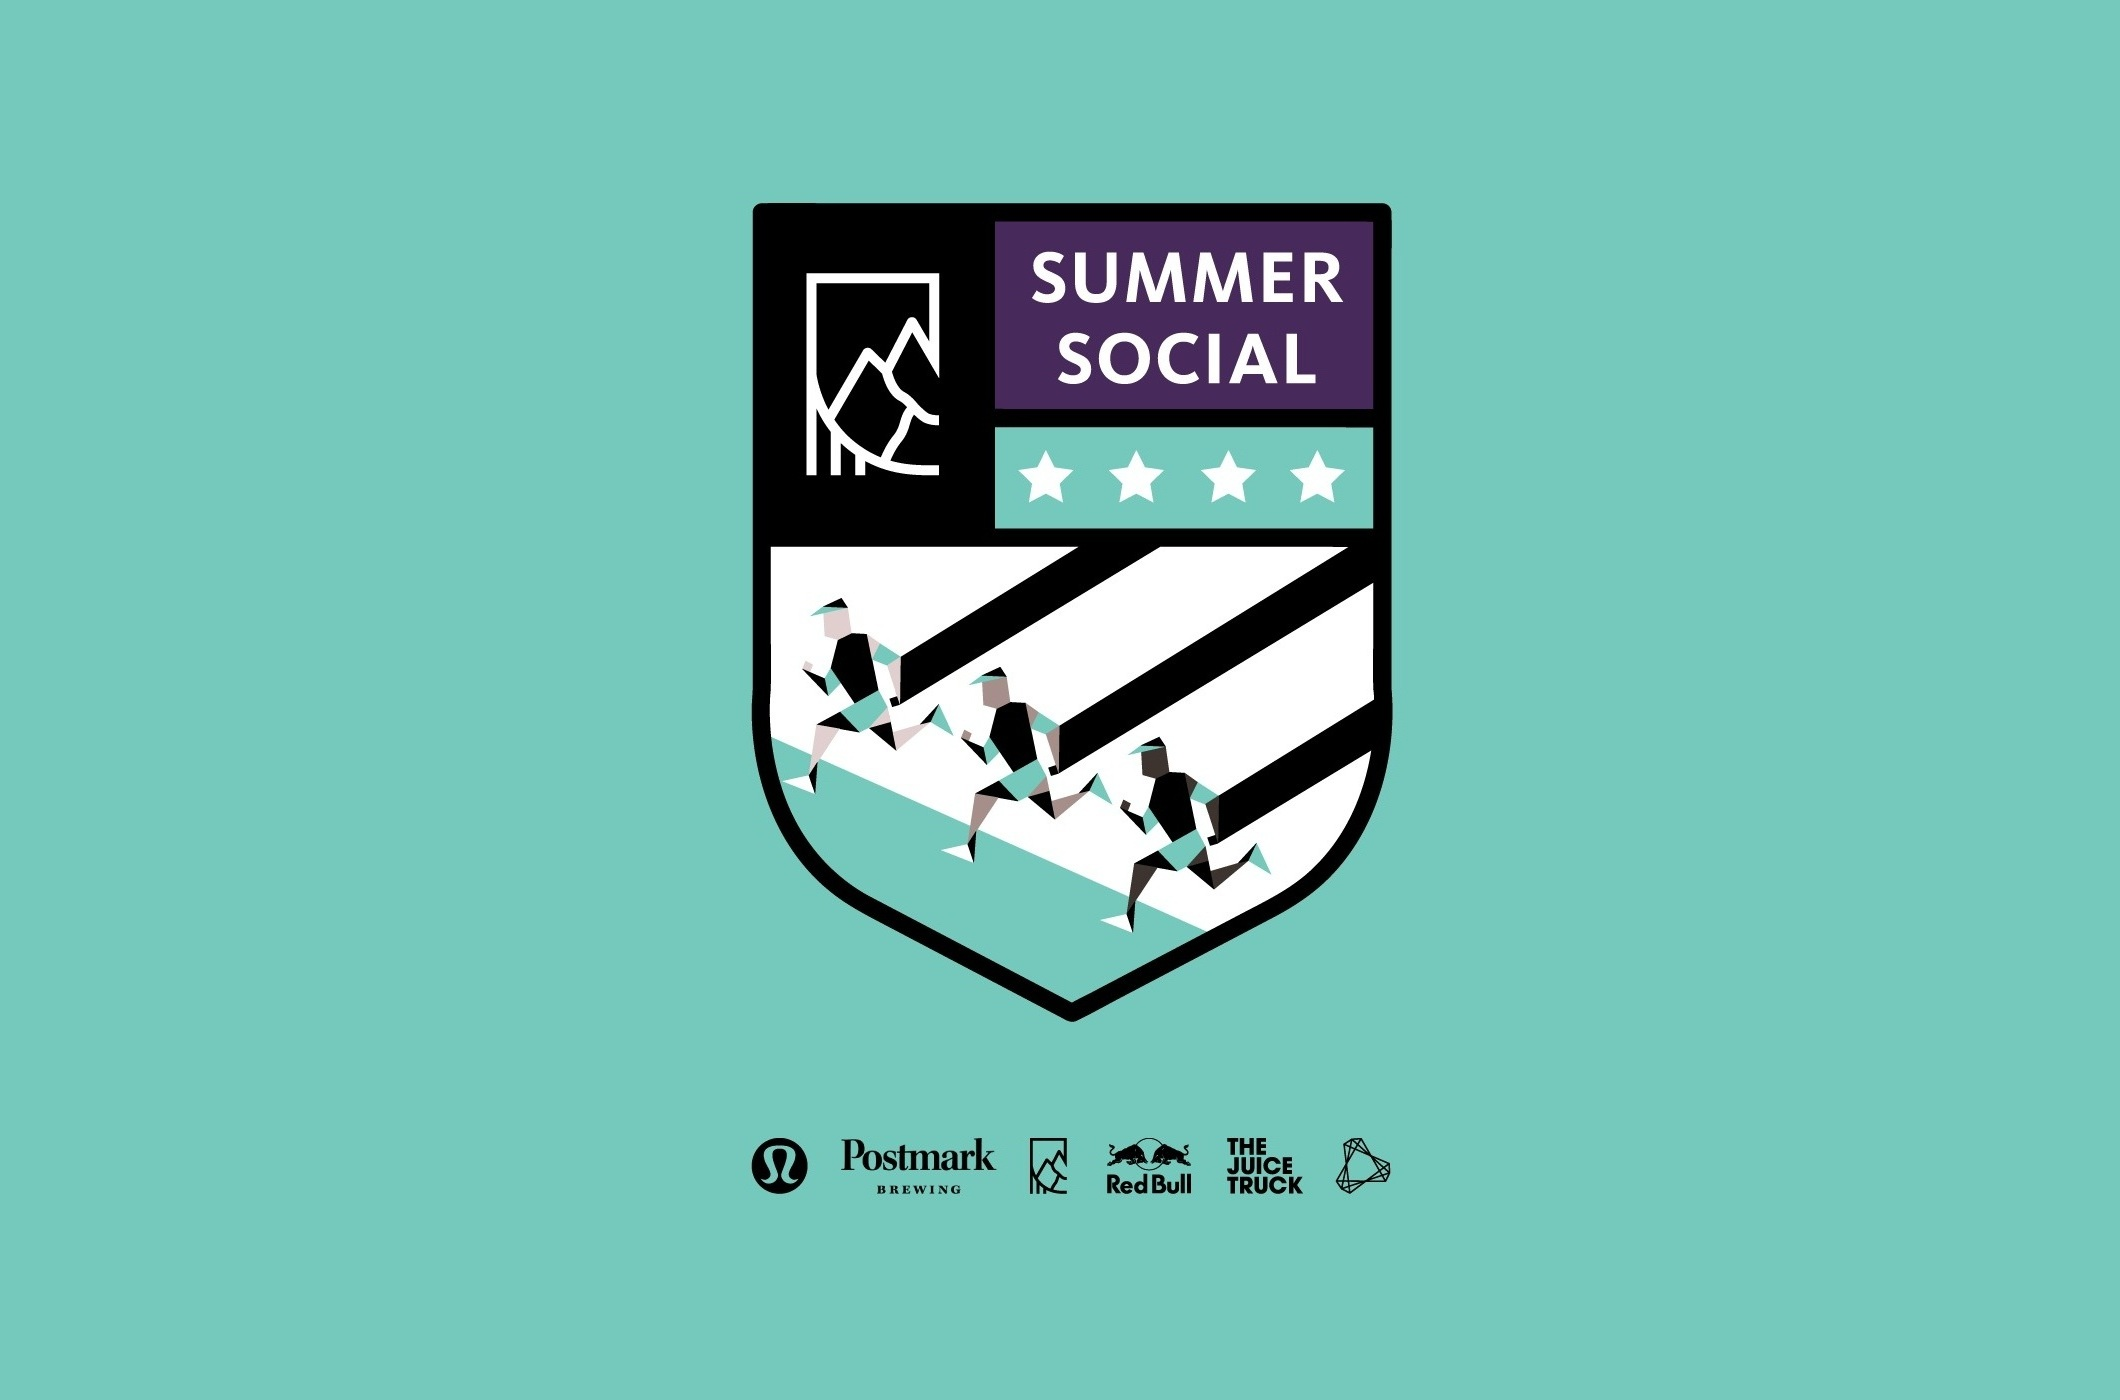 VRC_SummerSocial2018_Web_2400x1400-%25252528turquoise%25252529.jpg